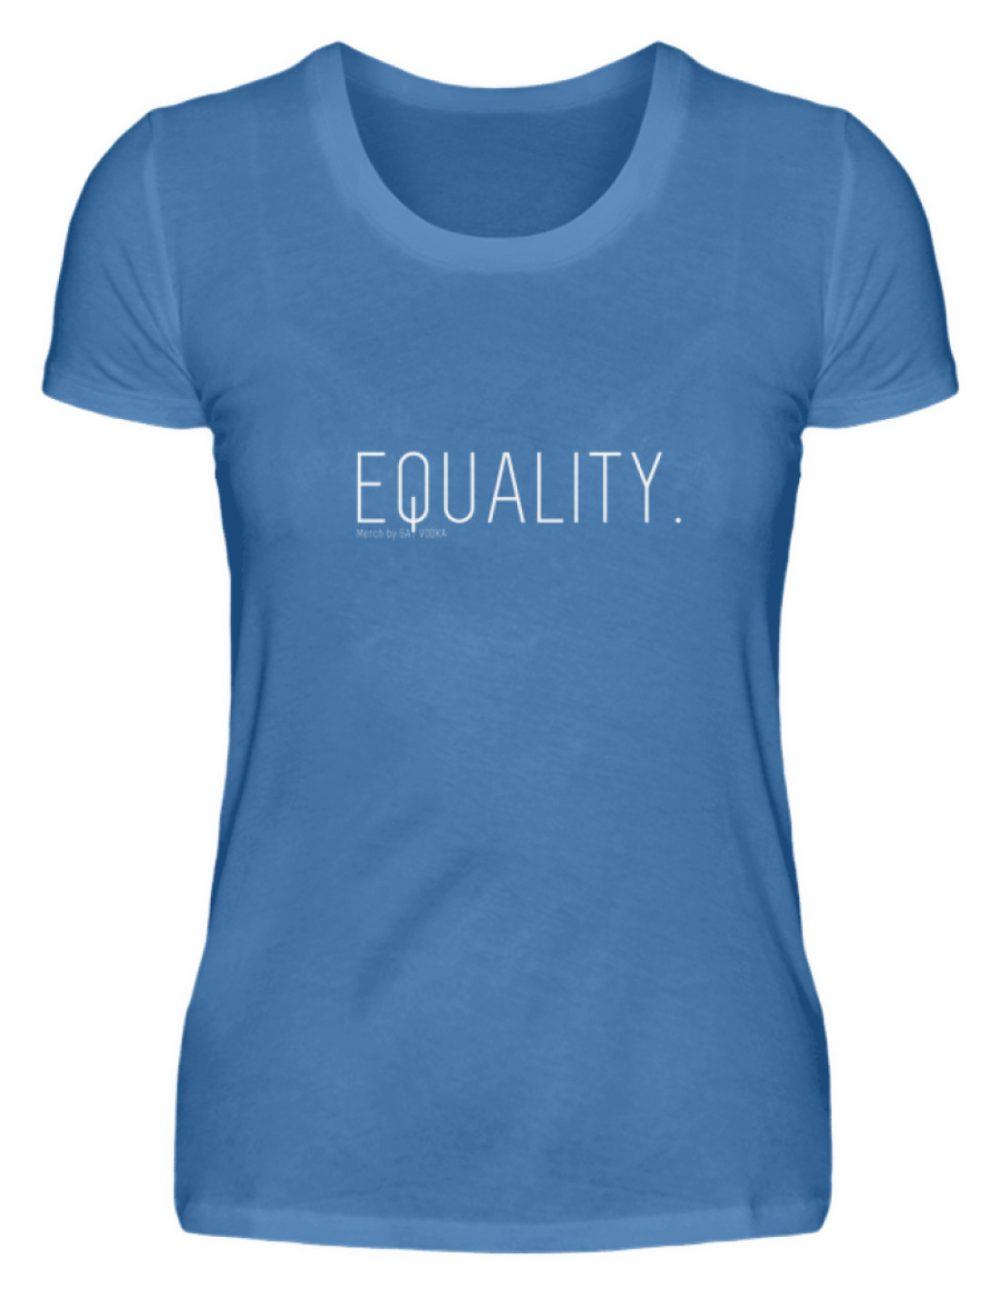 EQUALITY. - Damen Premiumshirt-2894